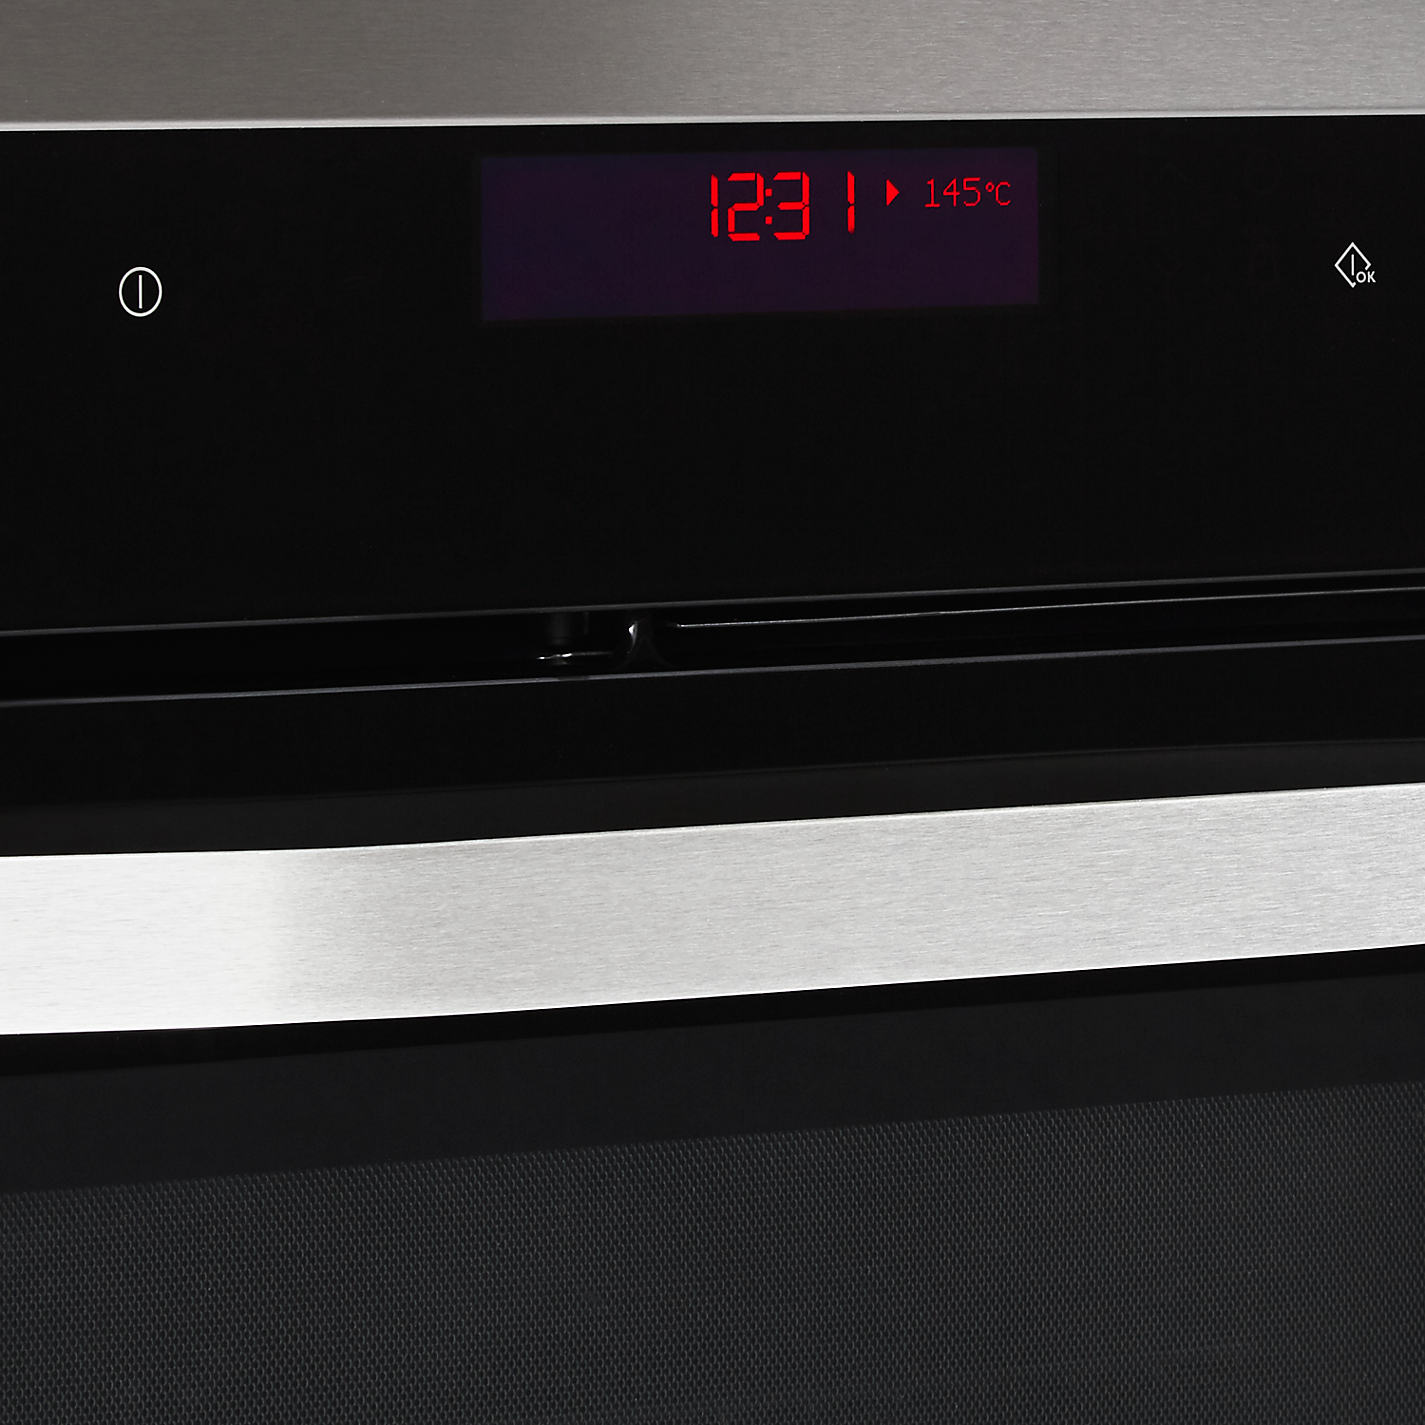 Black oven gloves john lewis -  Buy John Lewis Jlbic04 Built In Combination Microwave Black Stainless Steel Online At